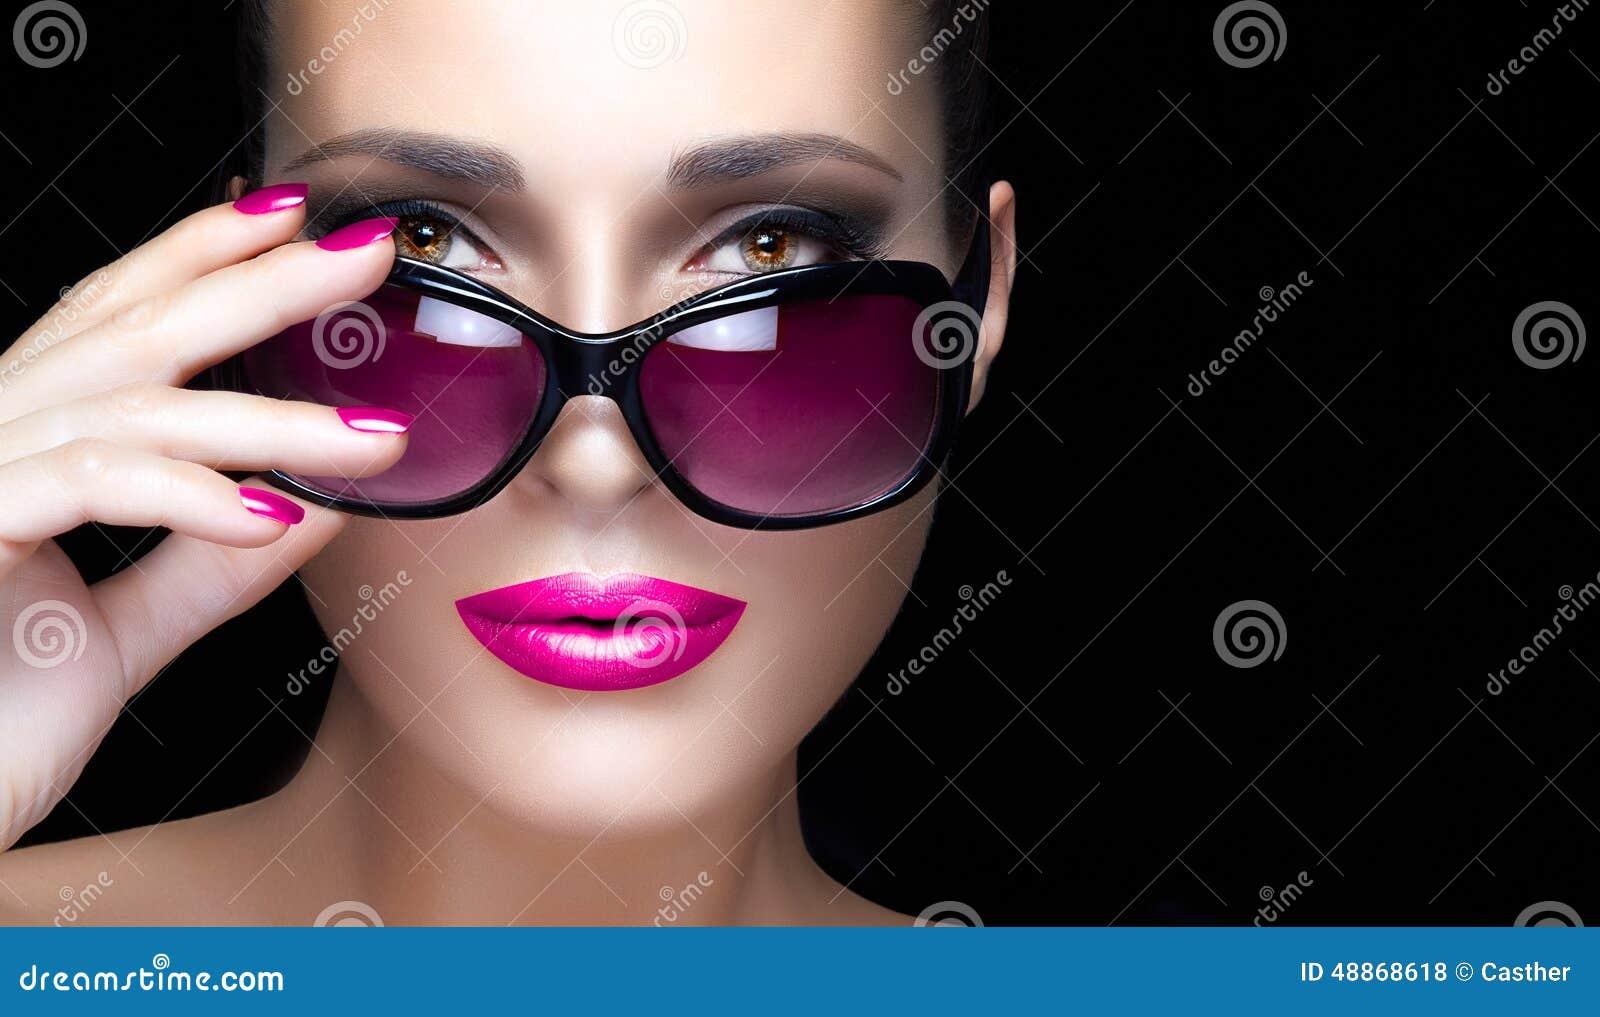 Closeup Woman Face In Pink Oversized Sunglasses. Makeup